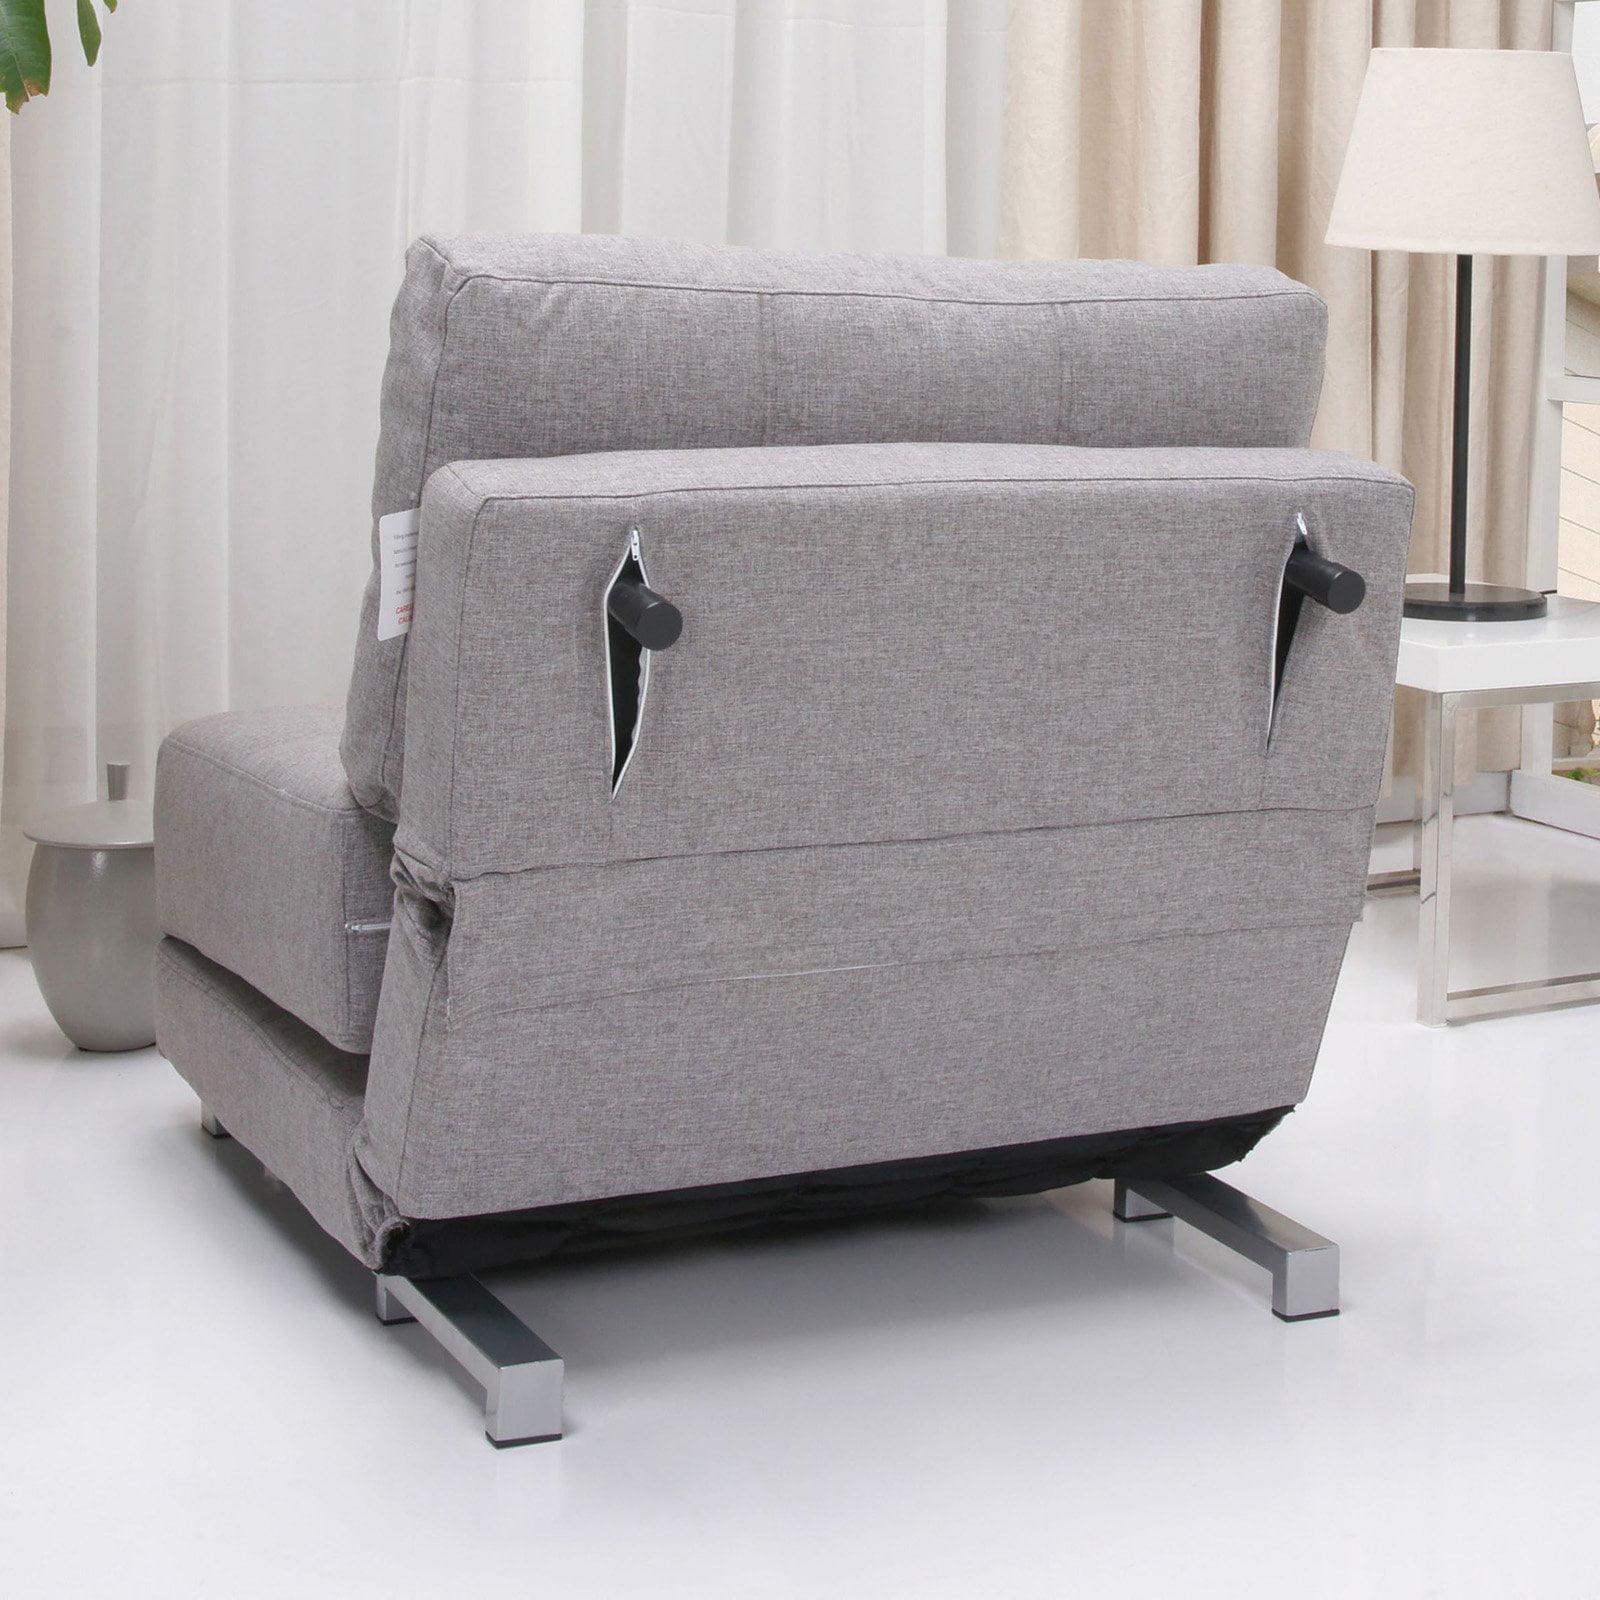 Enjoyable Gold Sparrow New York Convertible Fabric Chair Bed Lamtechconsult Wood Chair Design Ideas Lamtechconsultcom